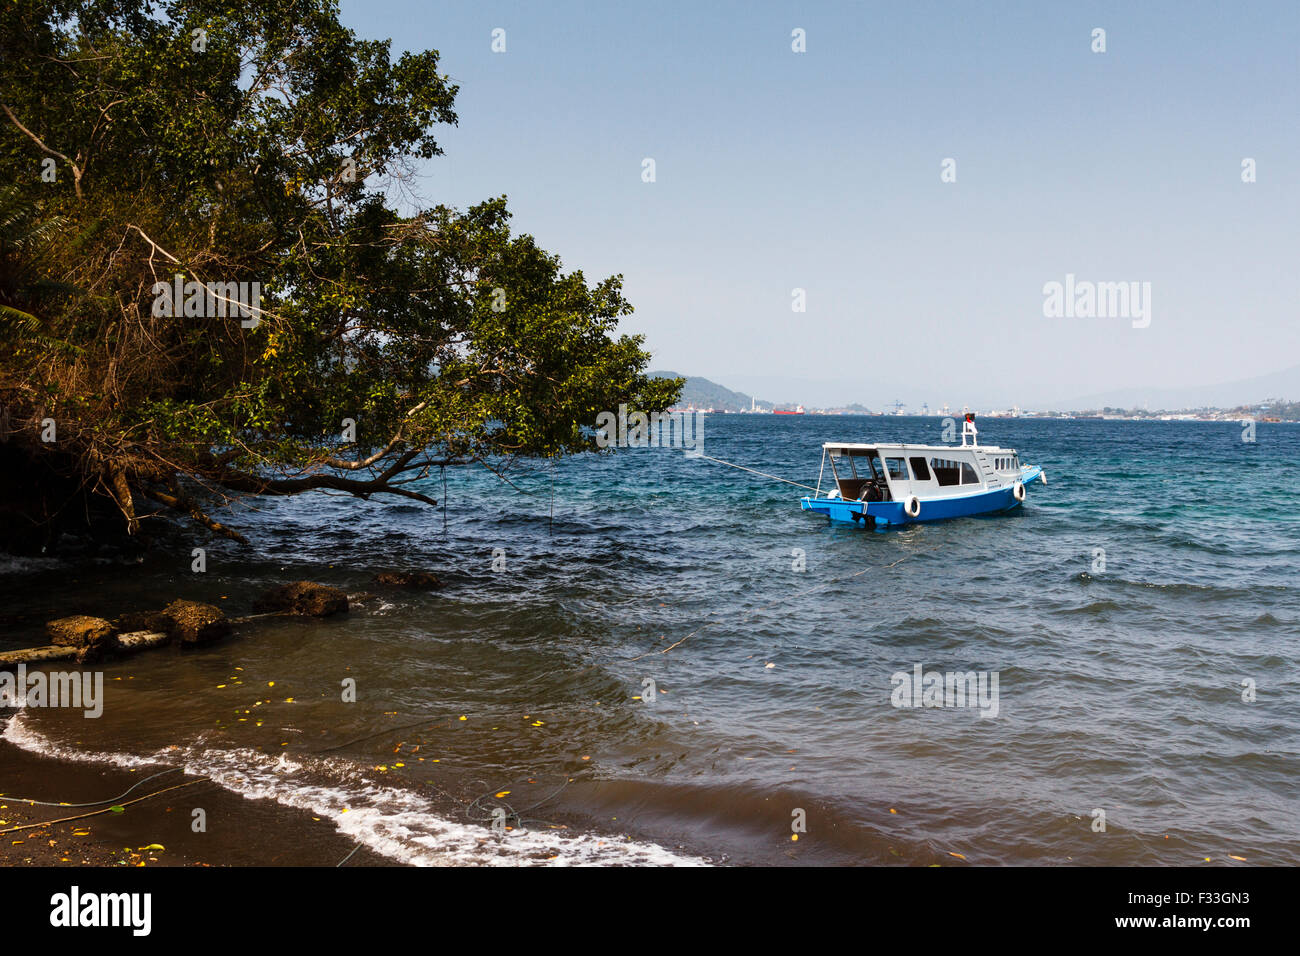 Barca in acqua a Lembeh strait, Nord Sulawesi, Indonesia Immagini Stock